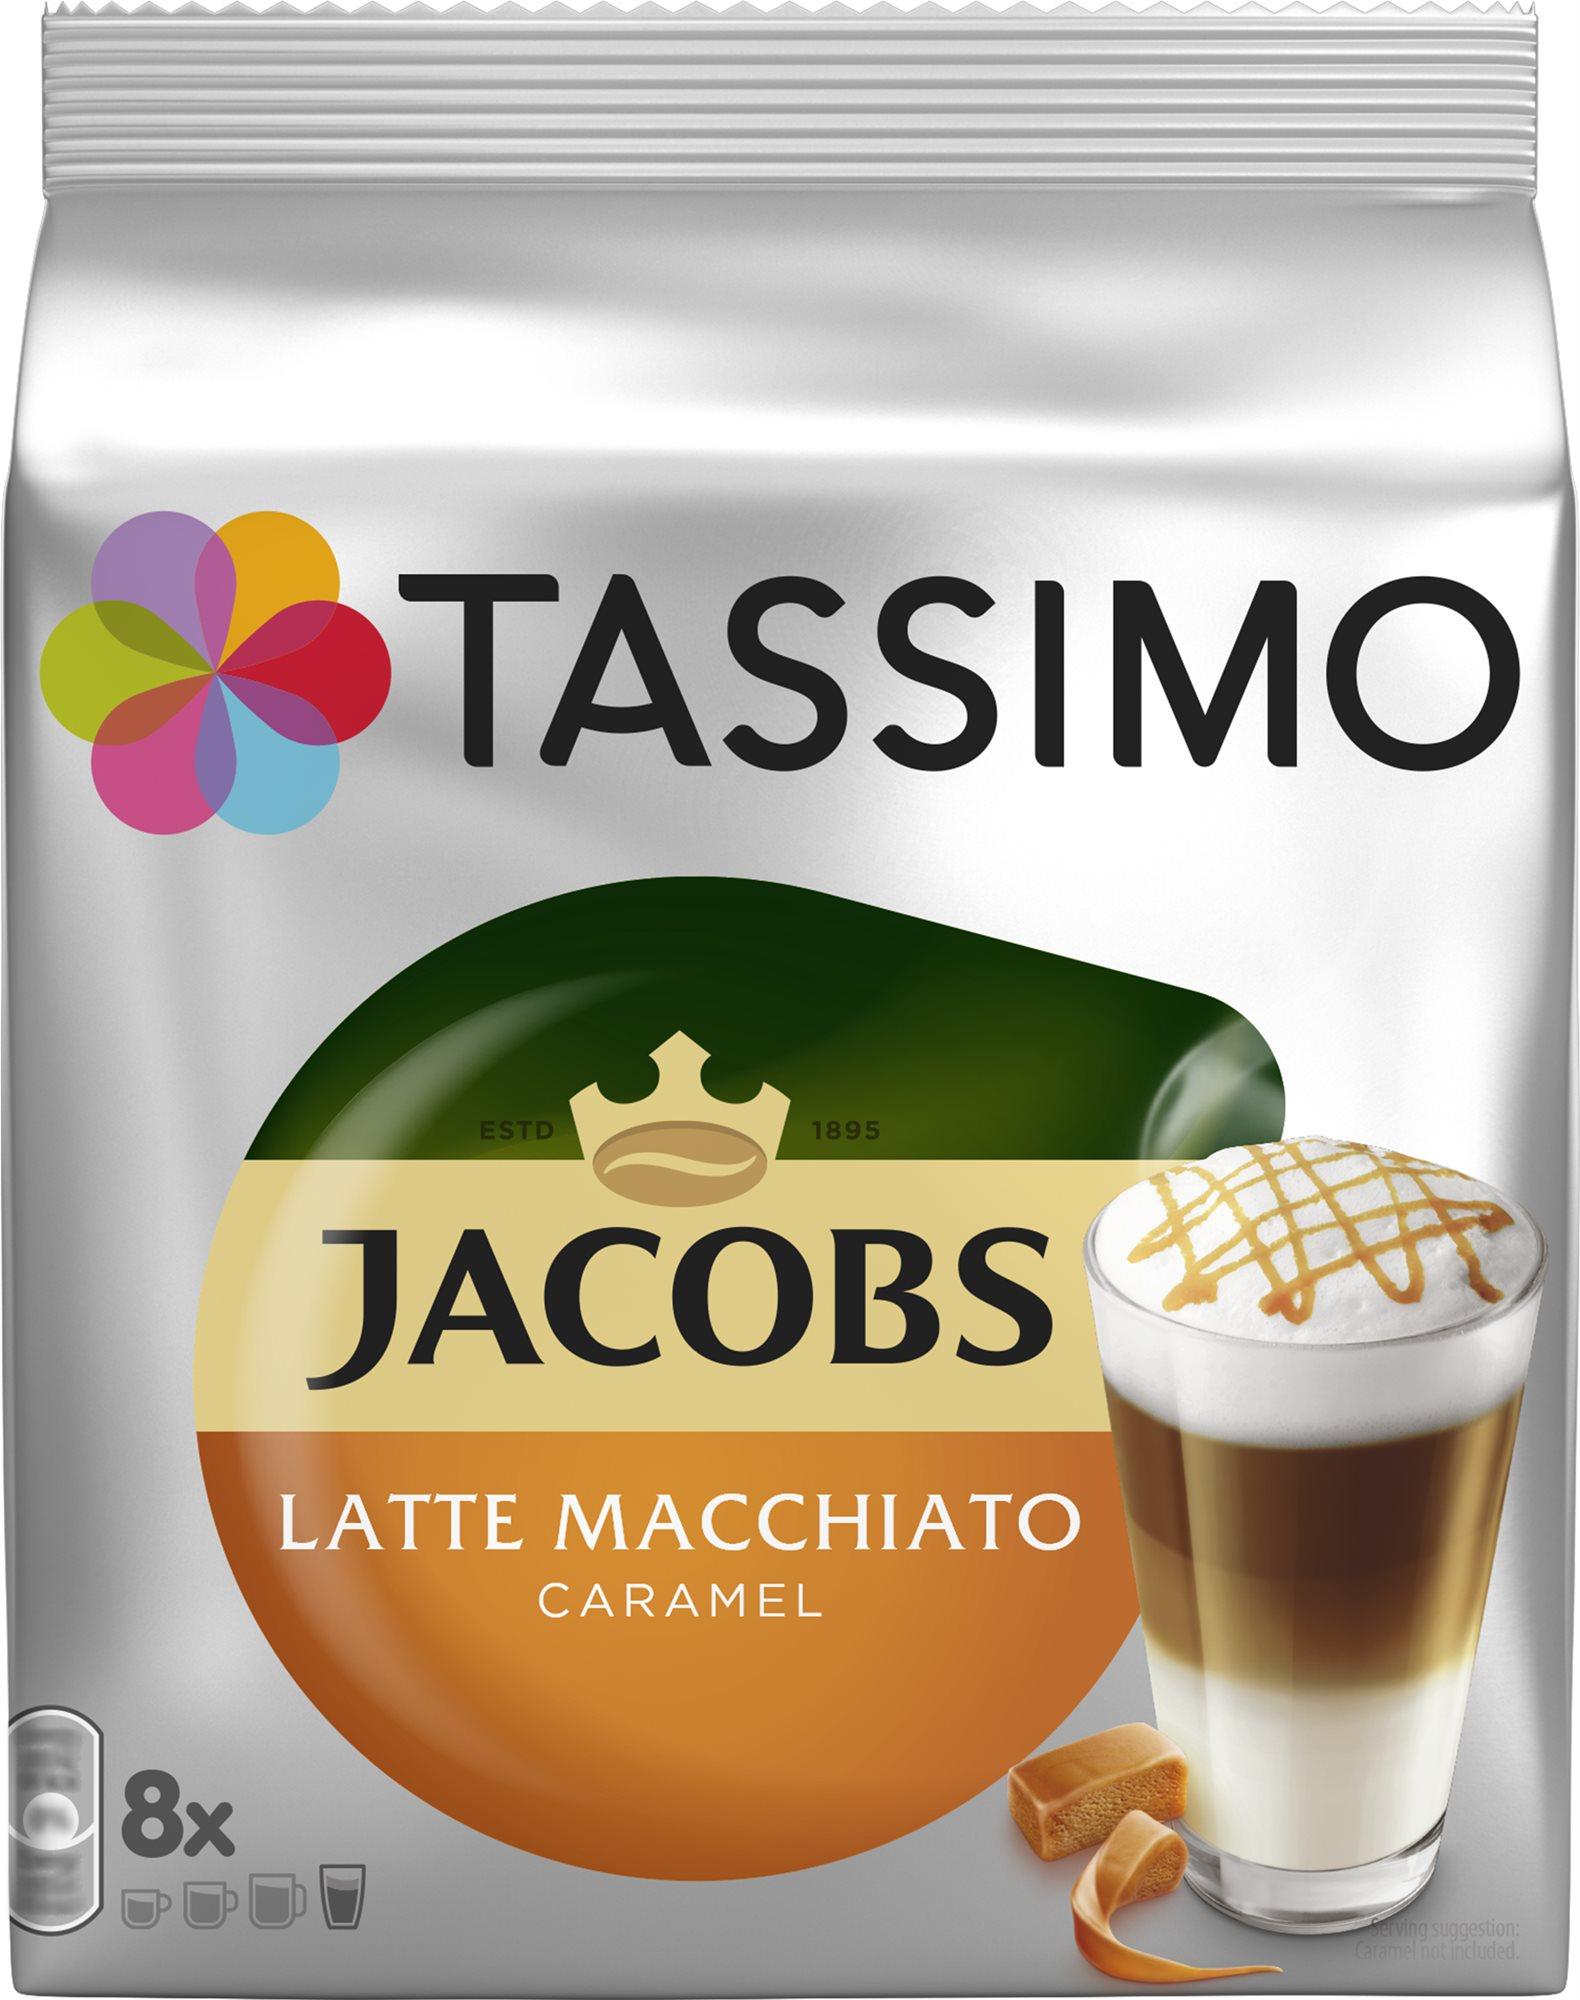 TASSIMO Jacobs Krönung Latte Macchiato karamell 8 adag